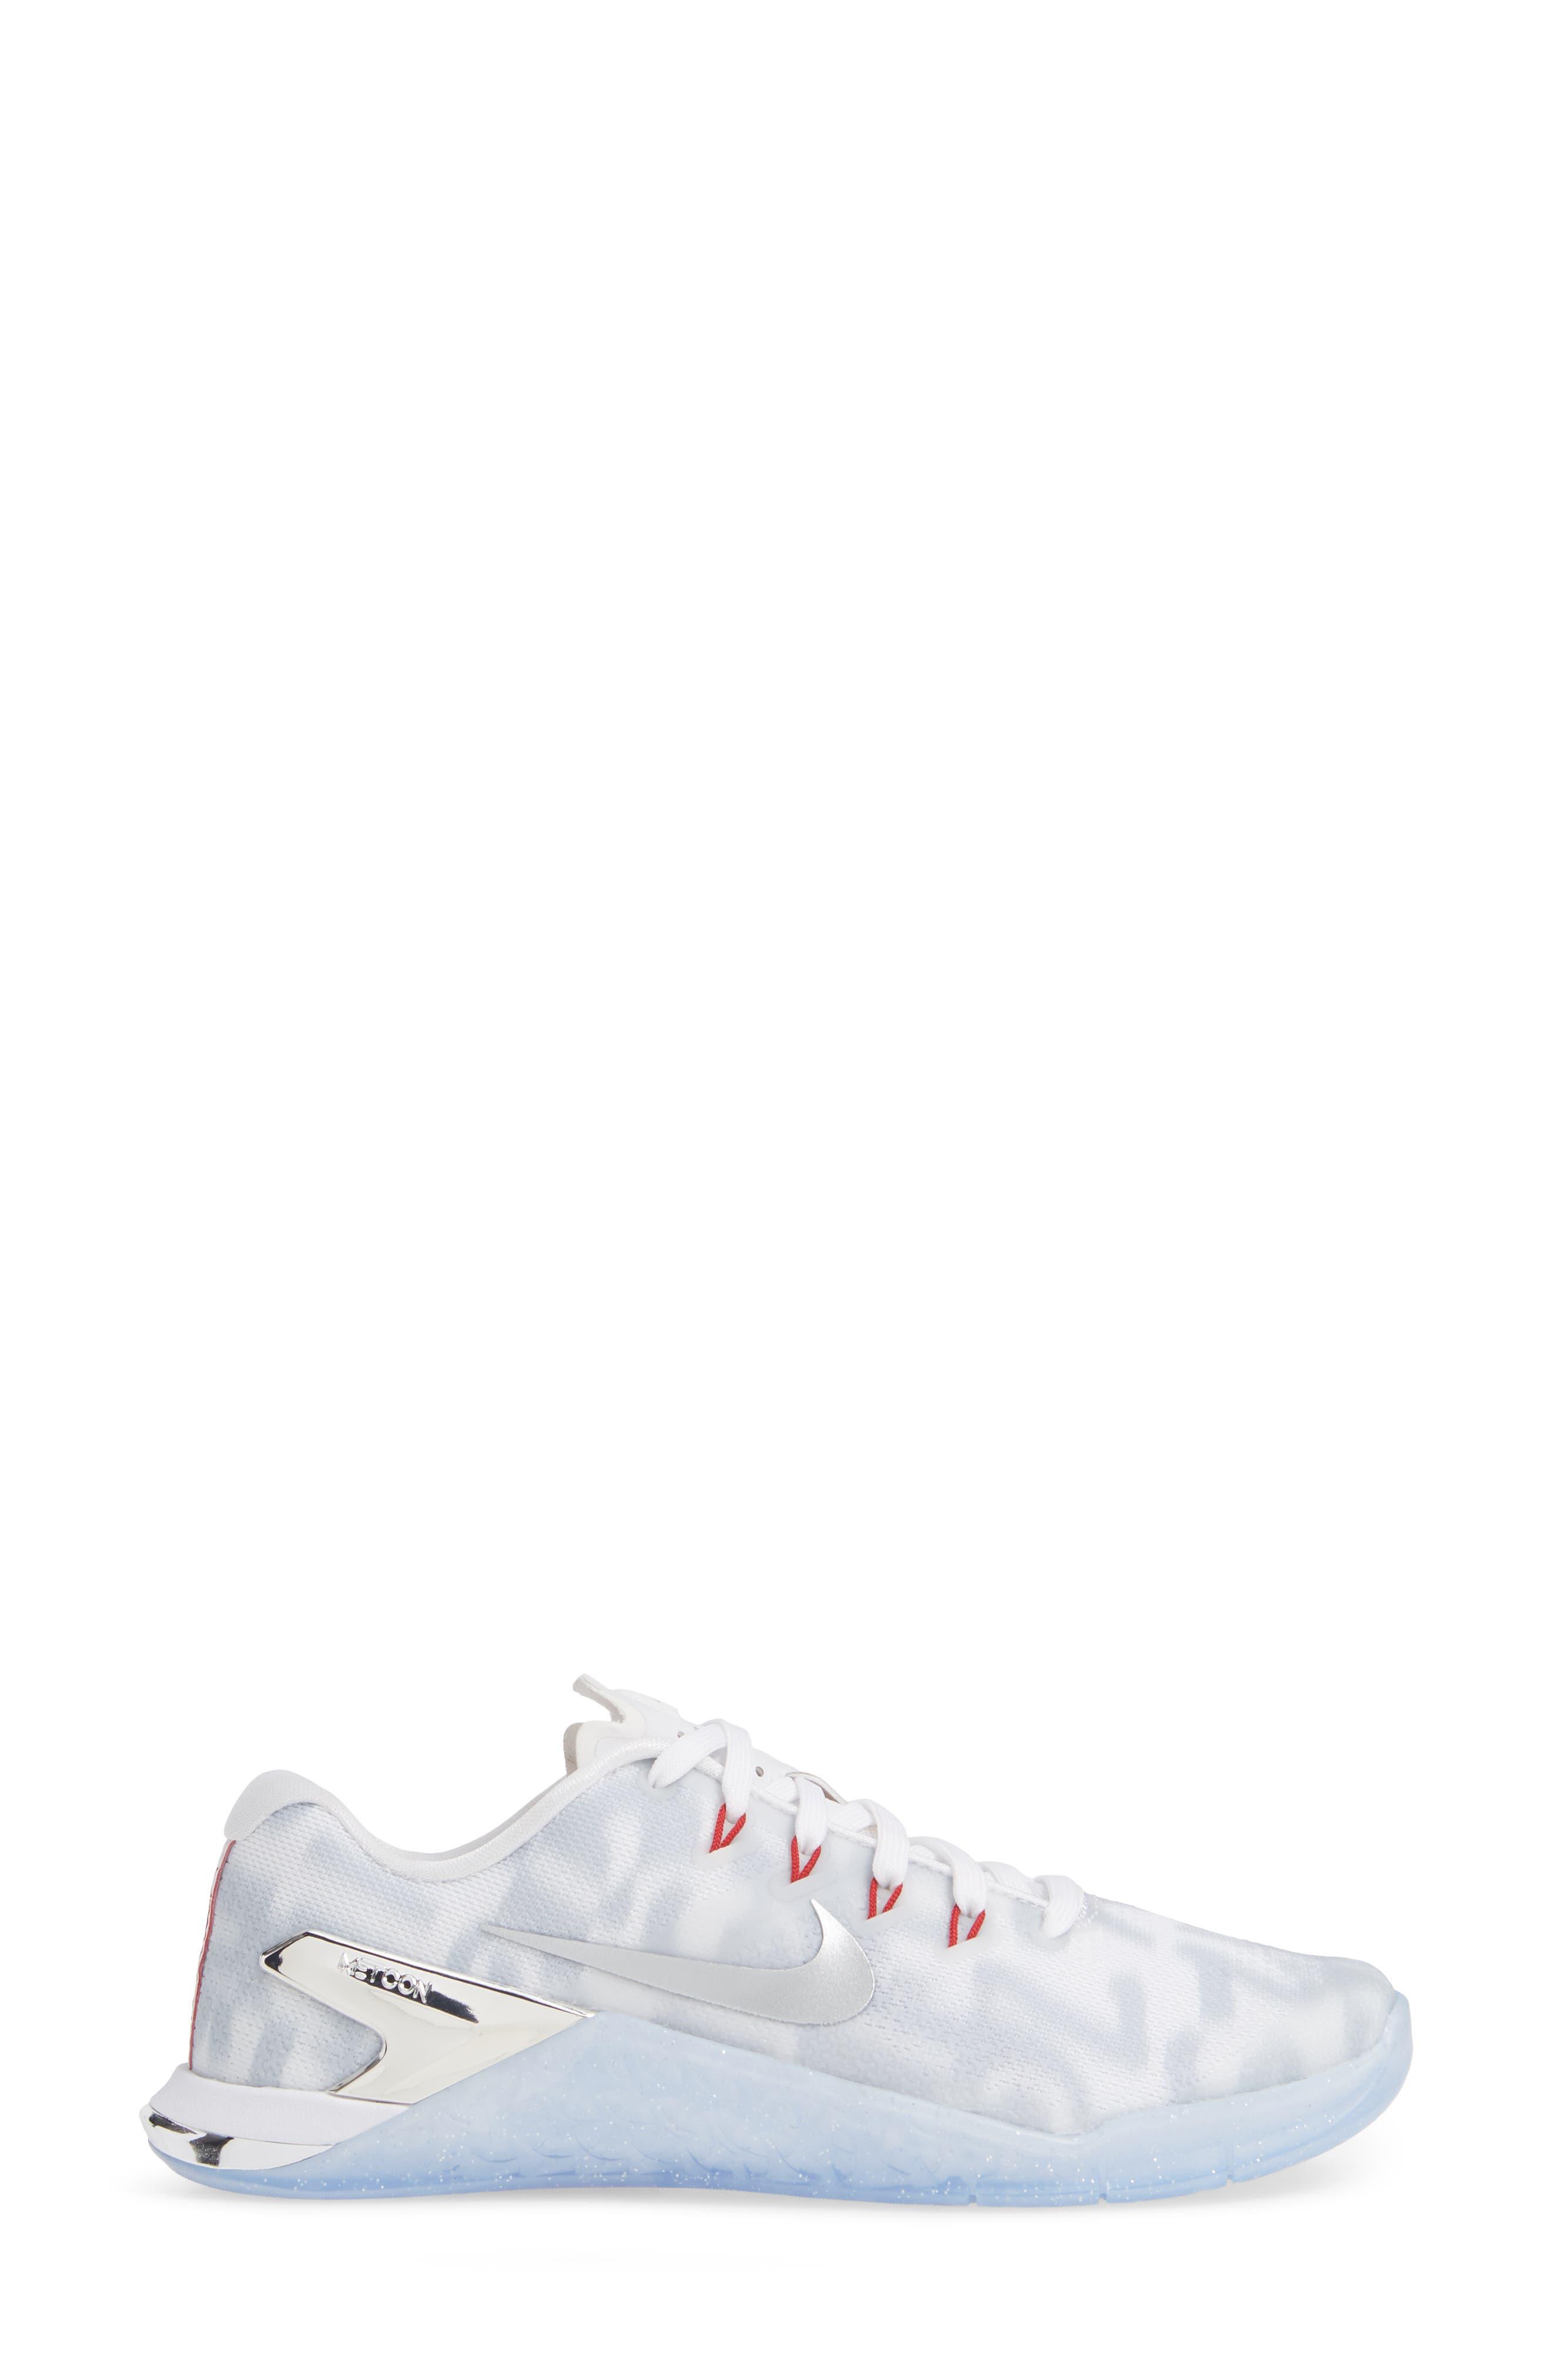 Metcon 4 Training Shoe,                             Alternate thumbnail 3, color,                             WHITE METALLIC SILVER/ GYM RED